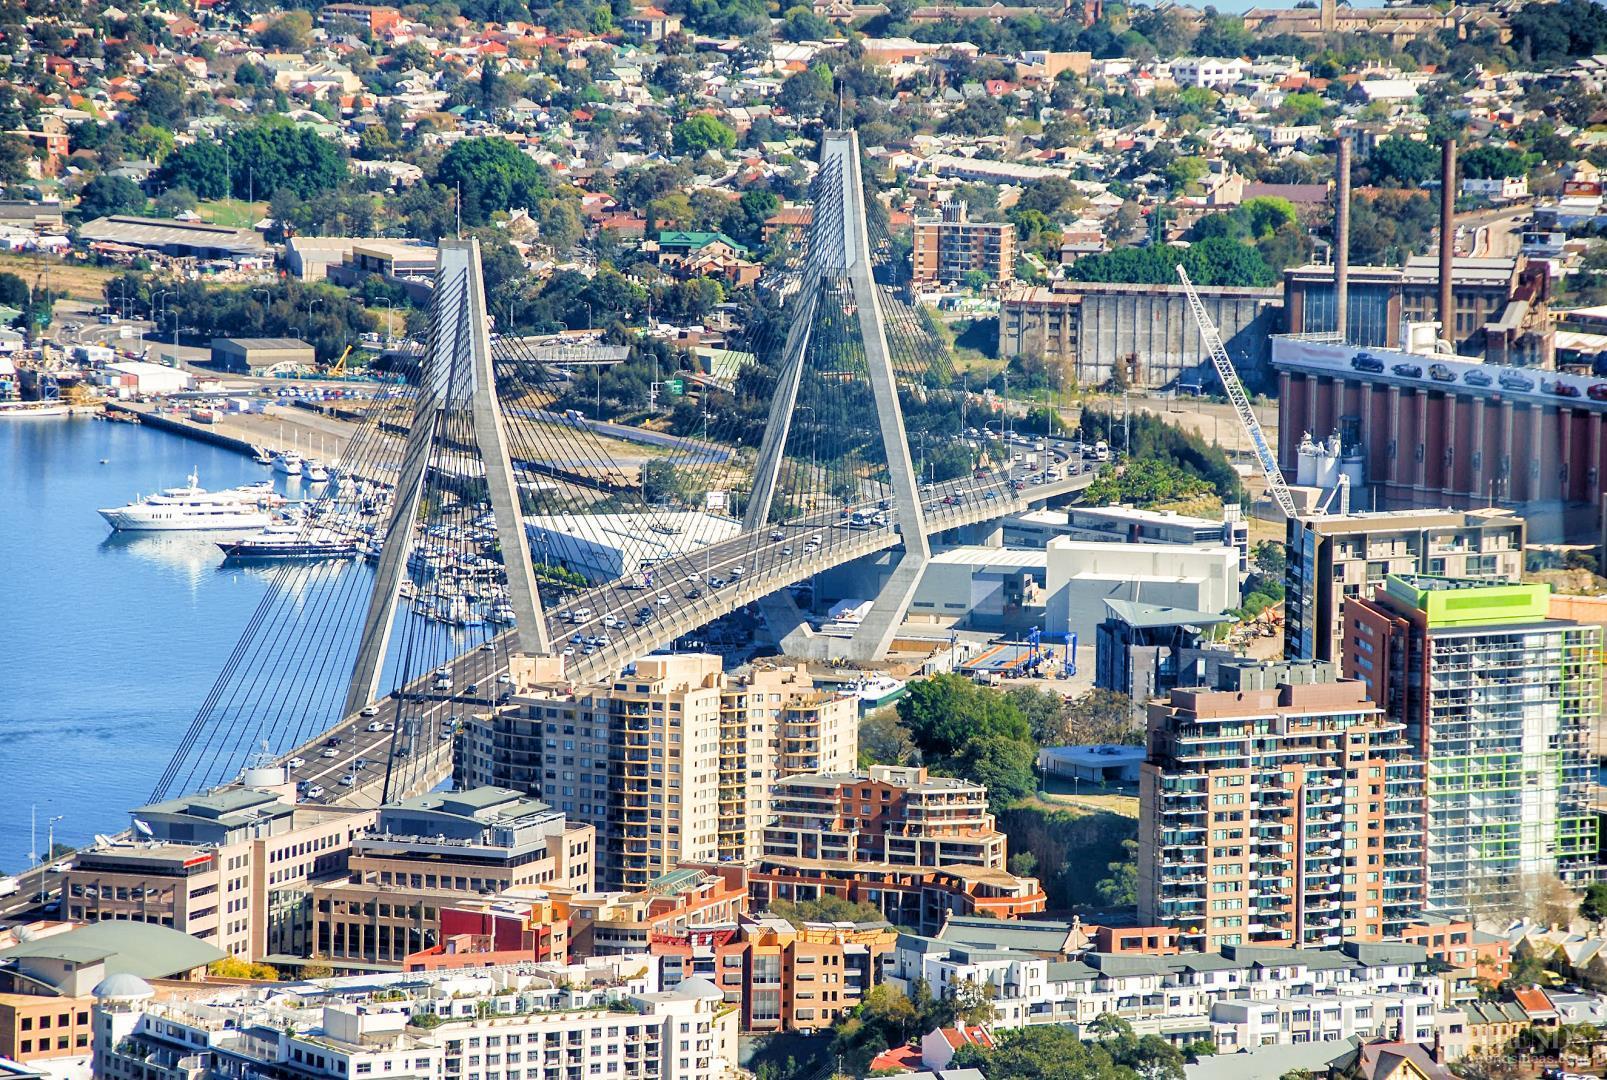 Infrastructure is an investment in communities – Urbis chief economist Nicki Hutley